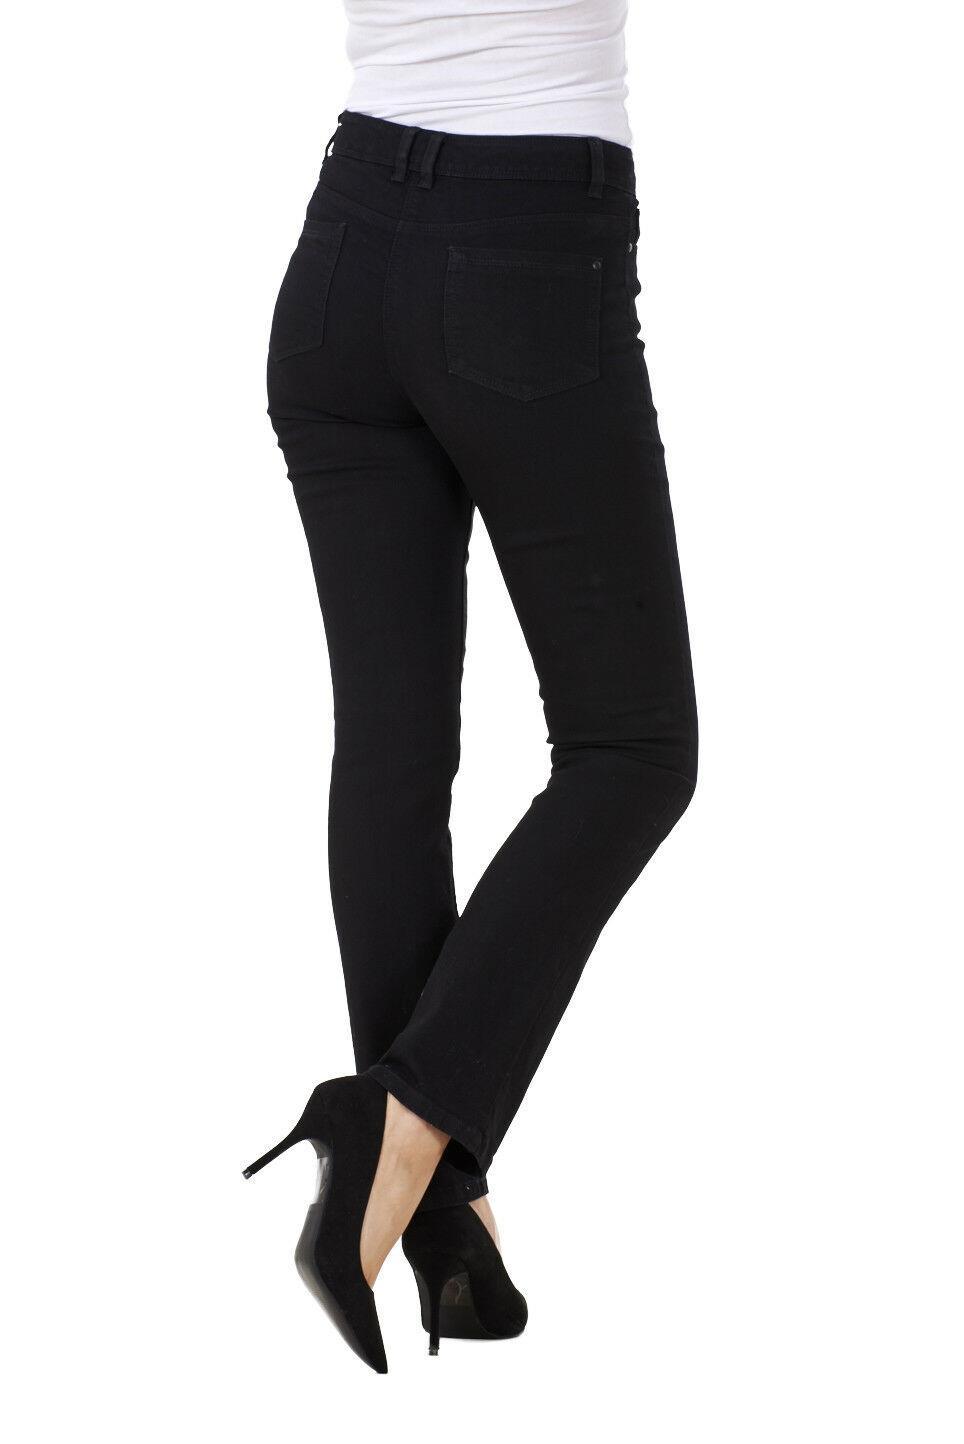 Ladies-Straight-Leg-Denim-Womens-Pants-Stretch-Regular-Fit-Jeans thumbnail 7